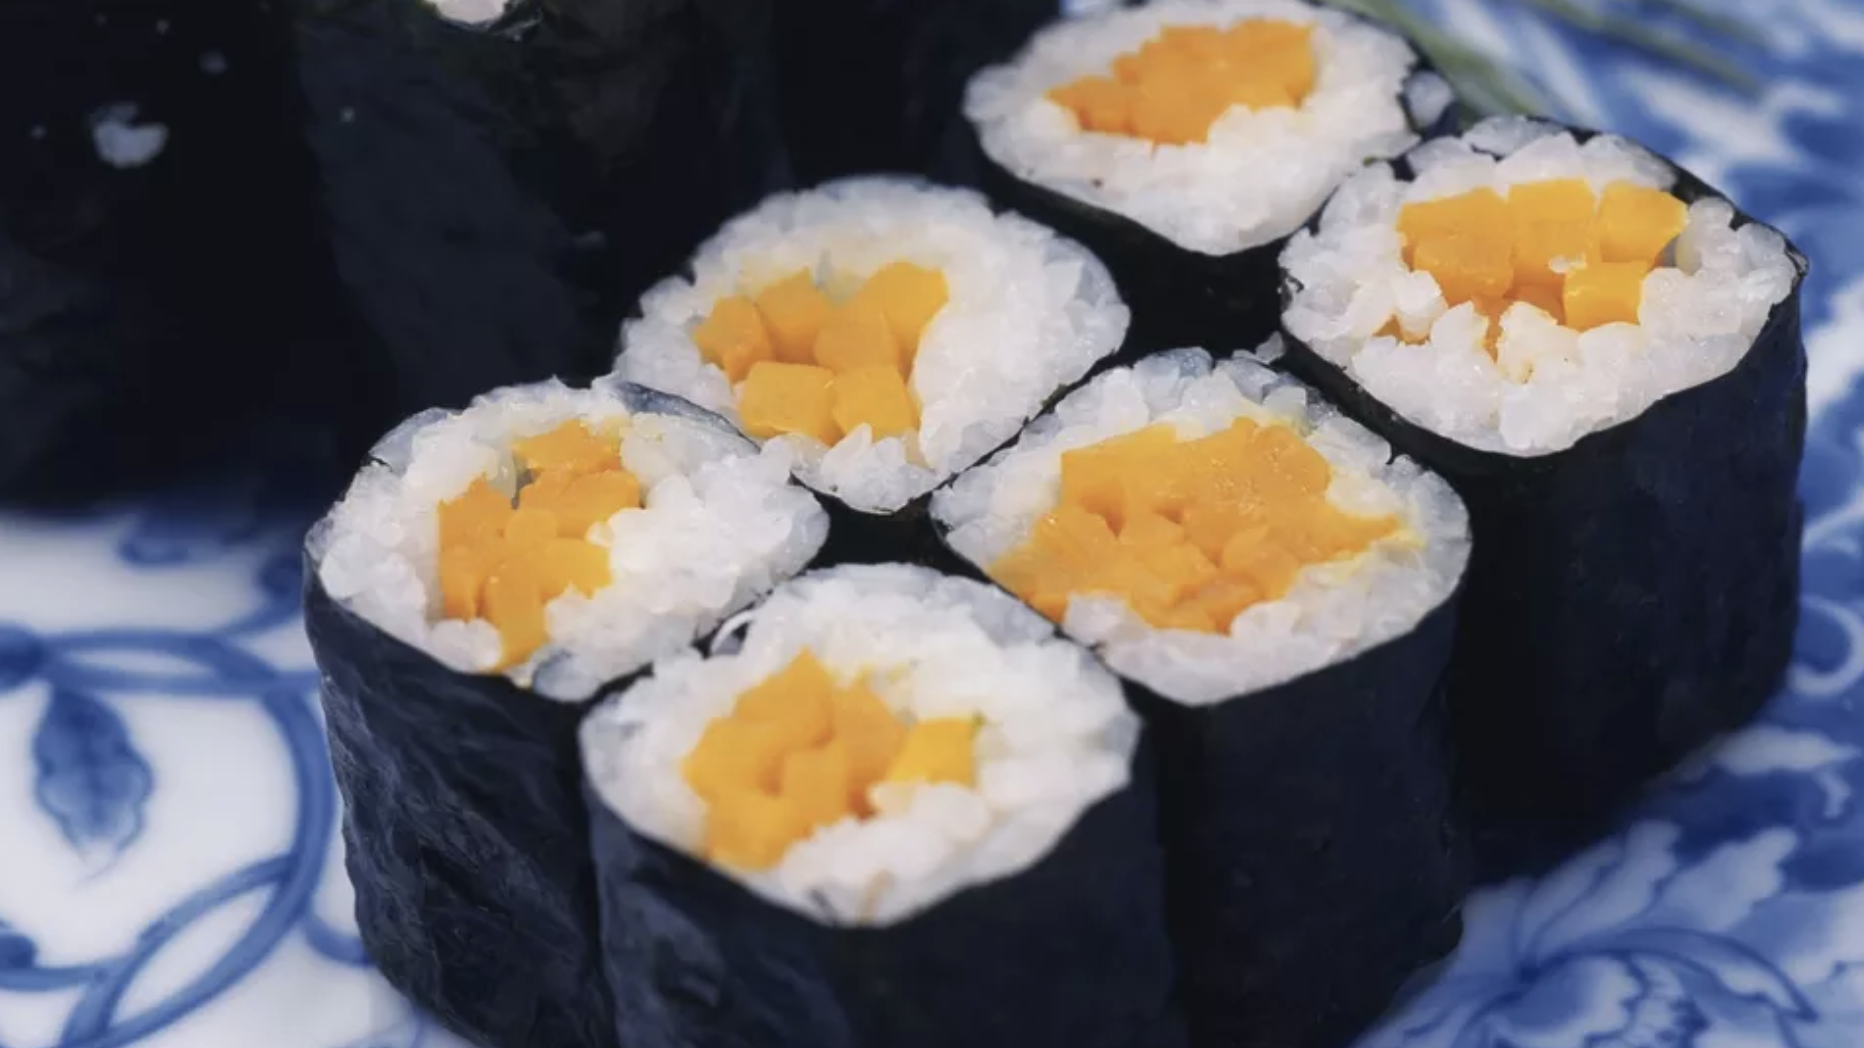 8. Pickled Daikon Sushi Roll (Oshiko Maki)